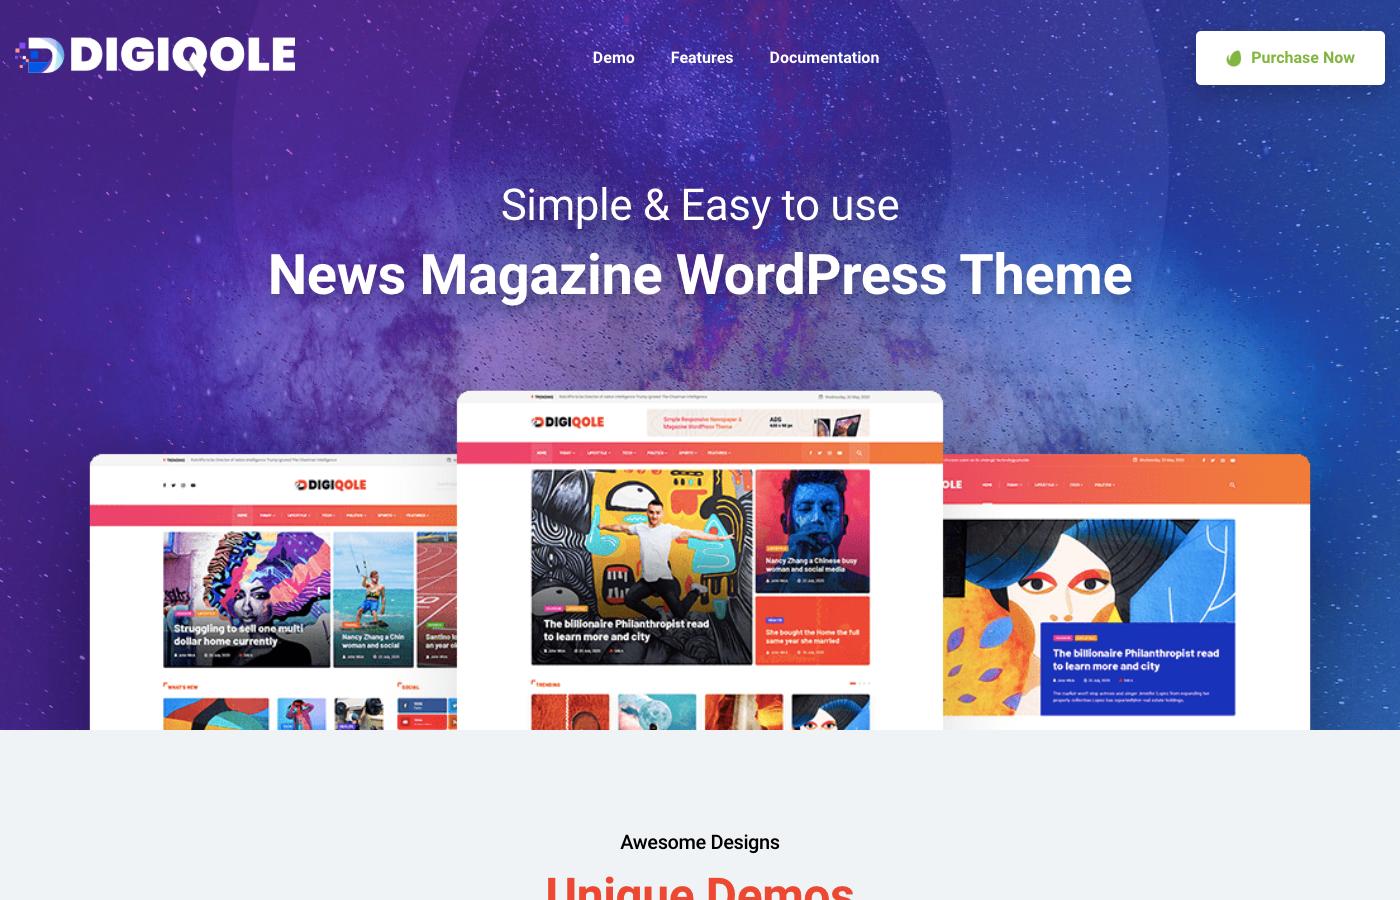 digiqole news magazine